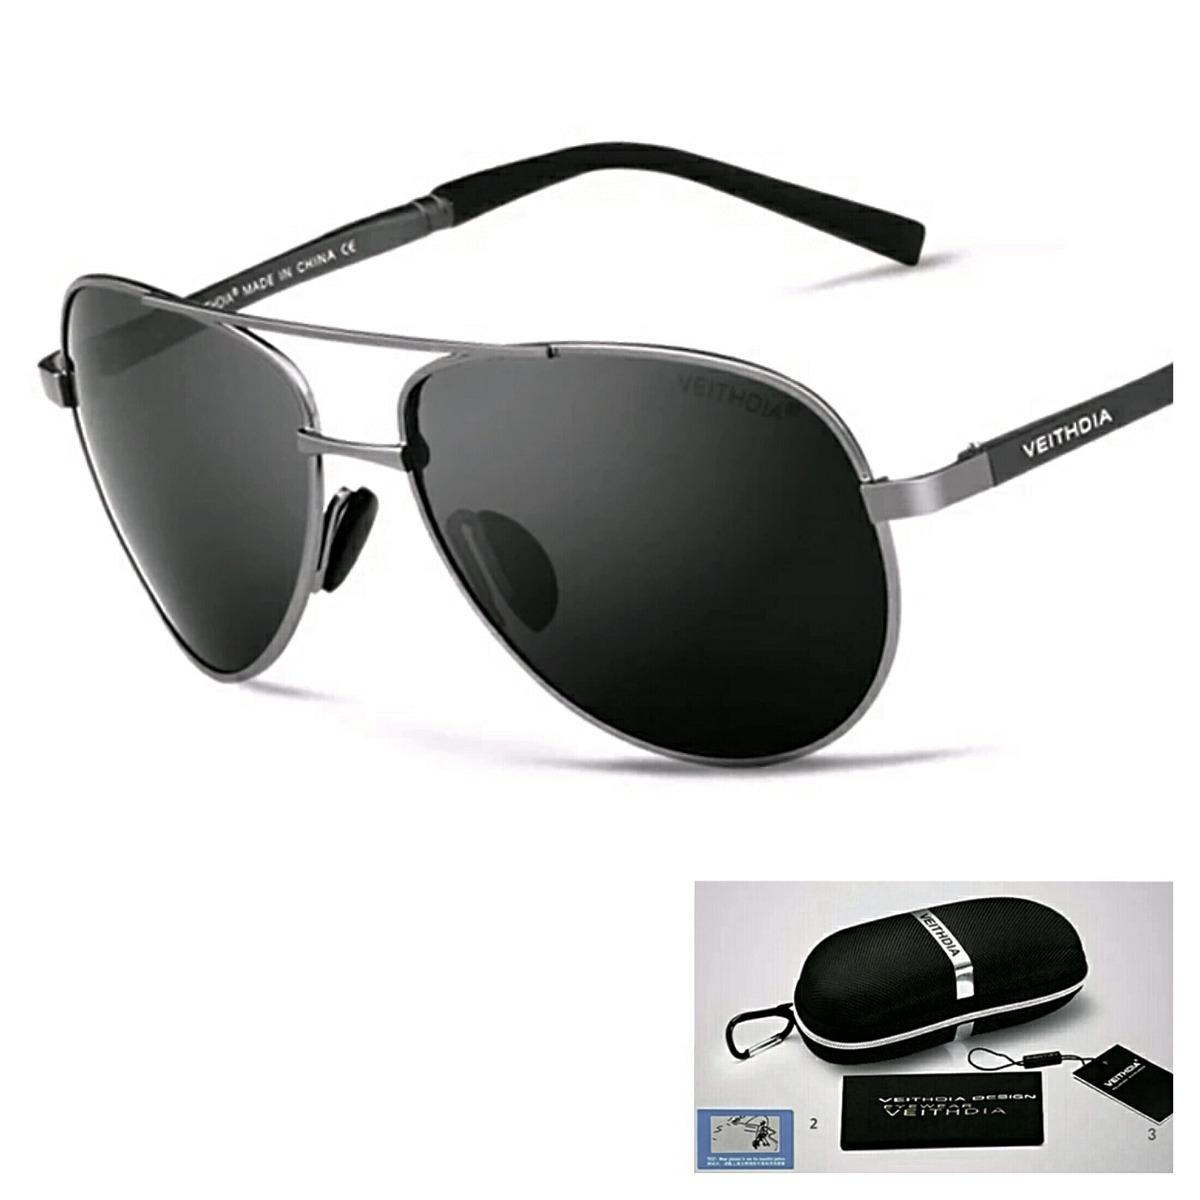 076e1bca4 óculos sol aviador masculino feminino polarizado uv400. Carregando zoom.